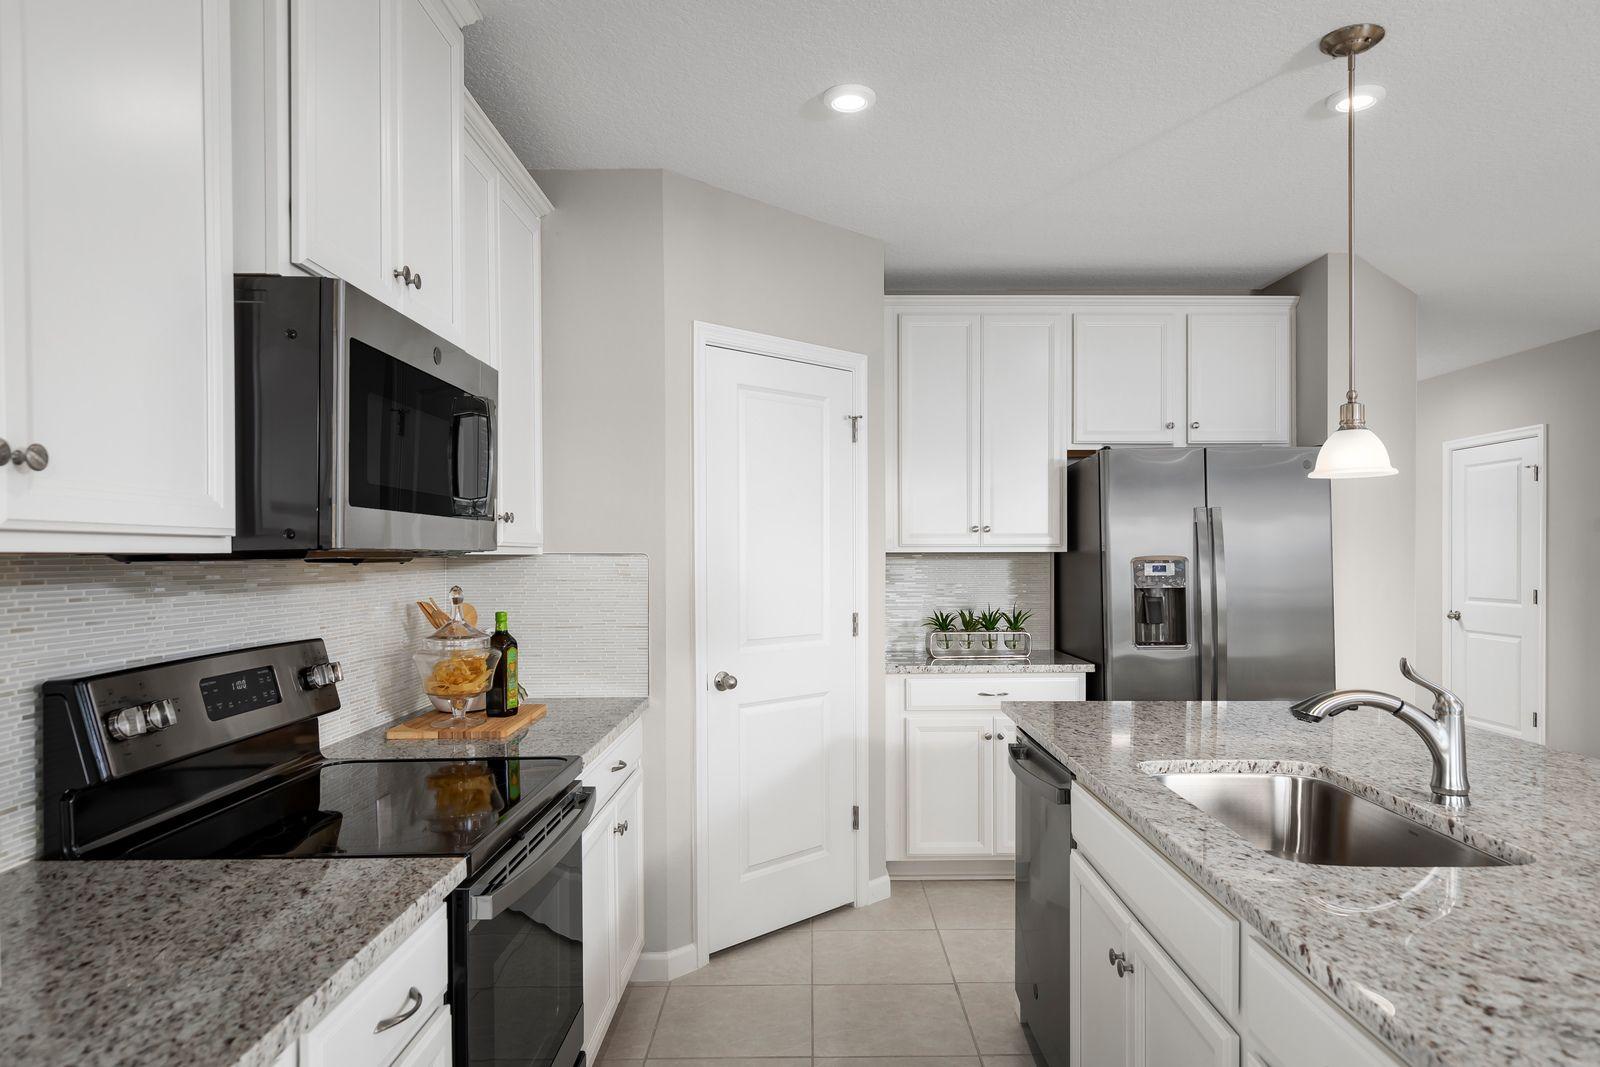 Kitchen featured in the Baymont By Ryan Homes in Orlando, FL